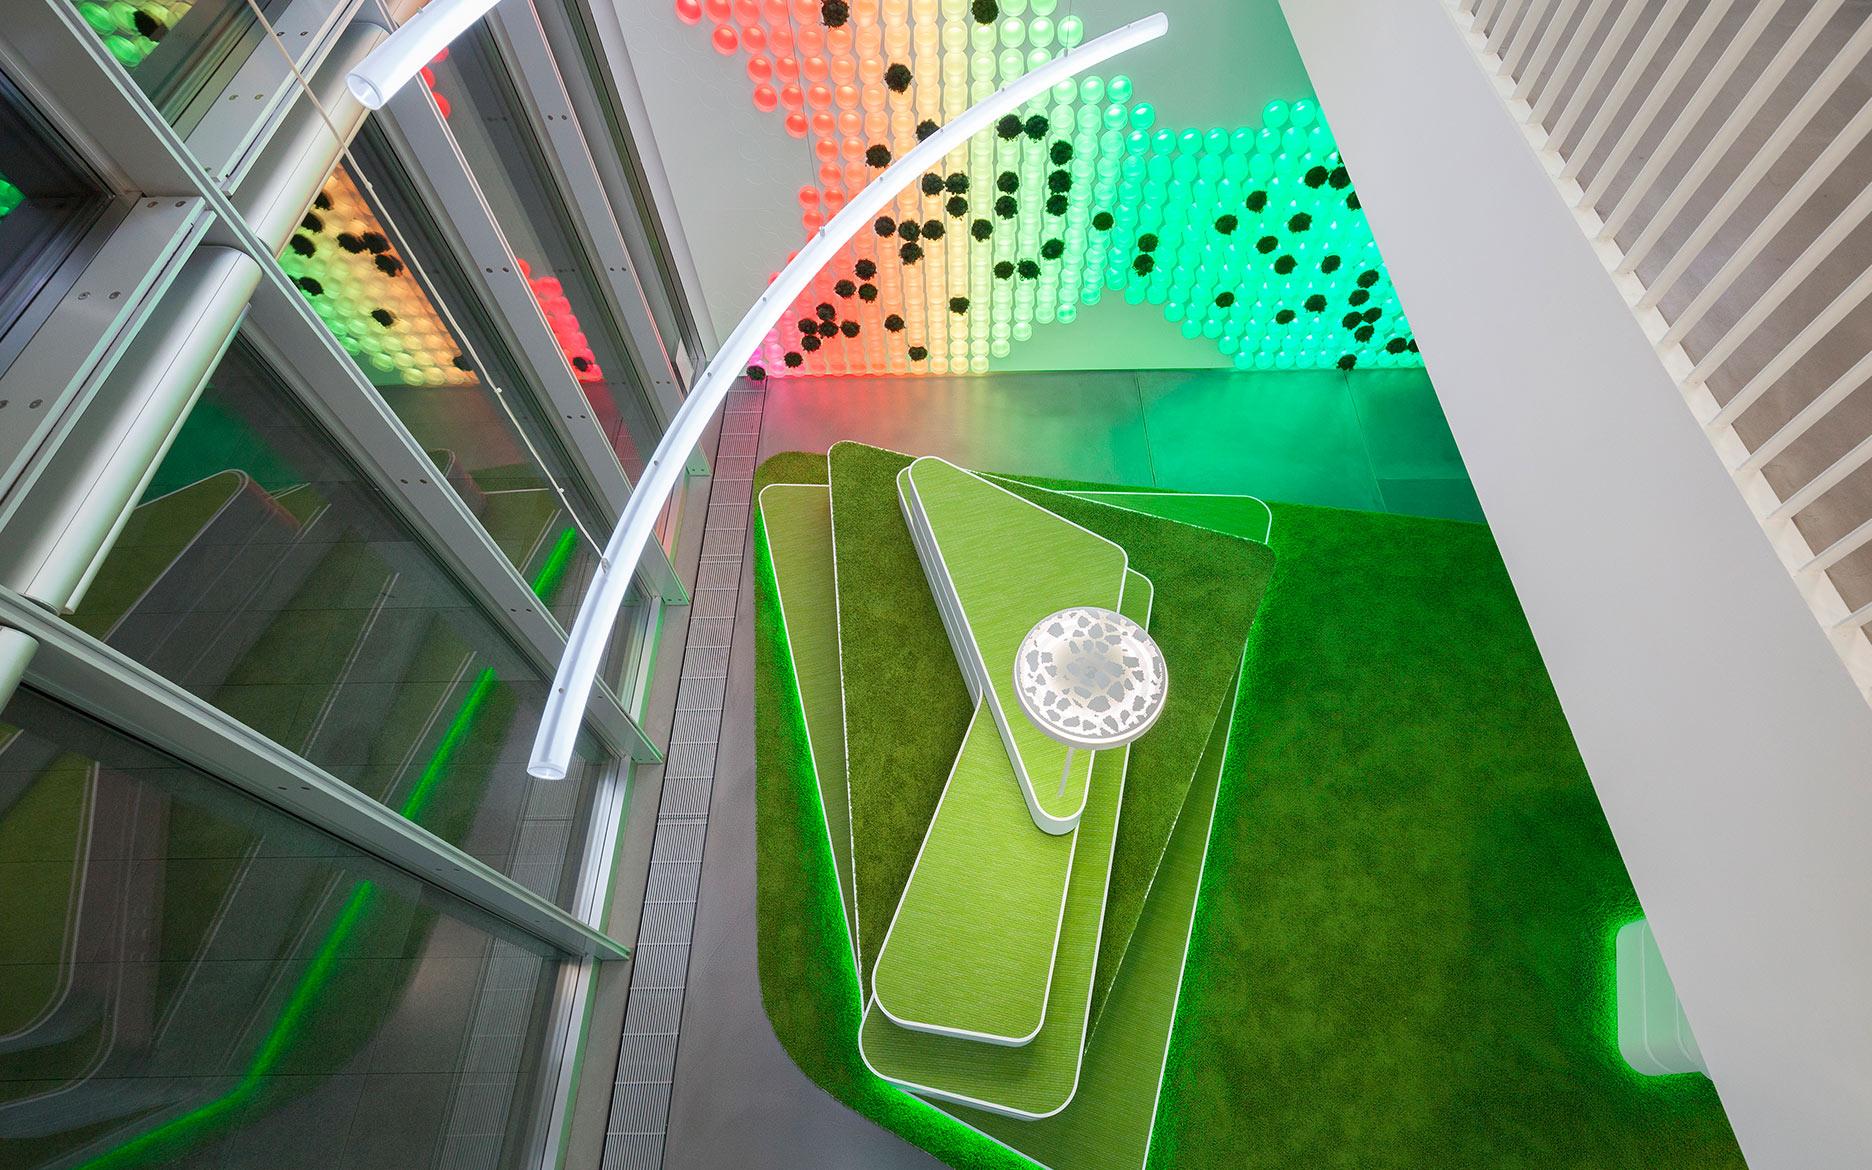 InVision LED Festinstallation Düsseldorf tennagels